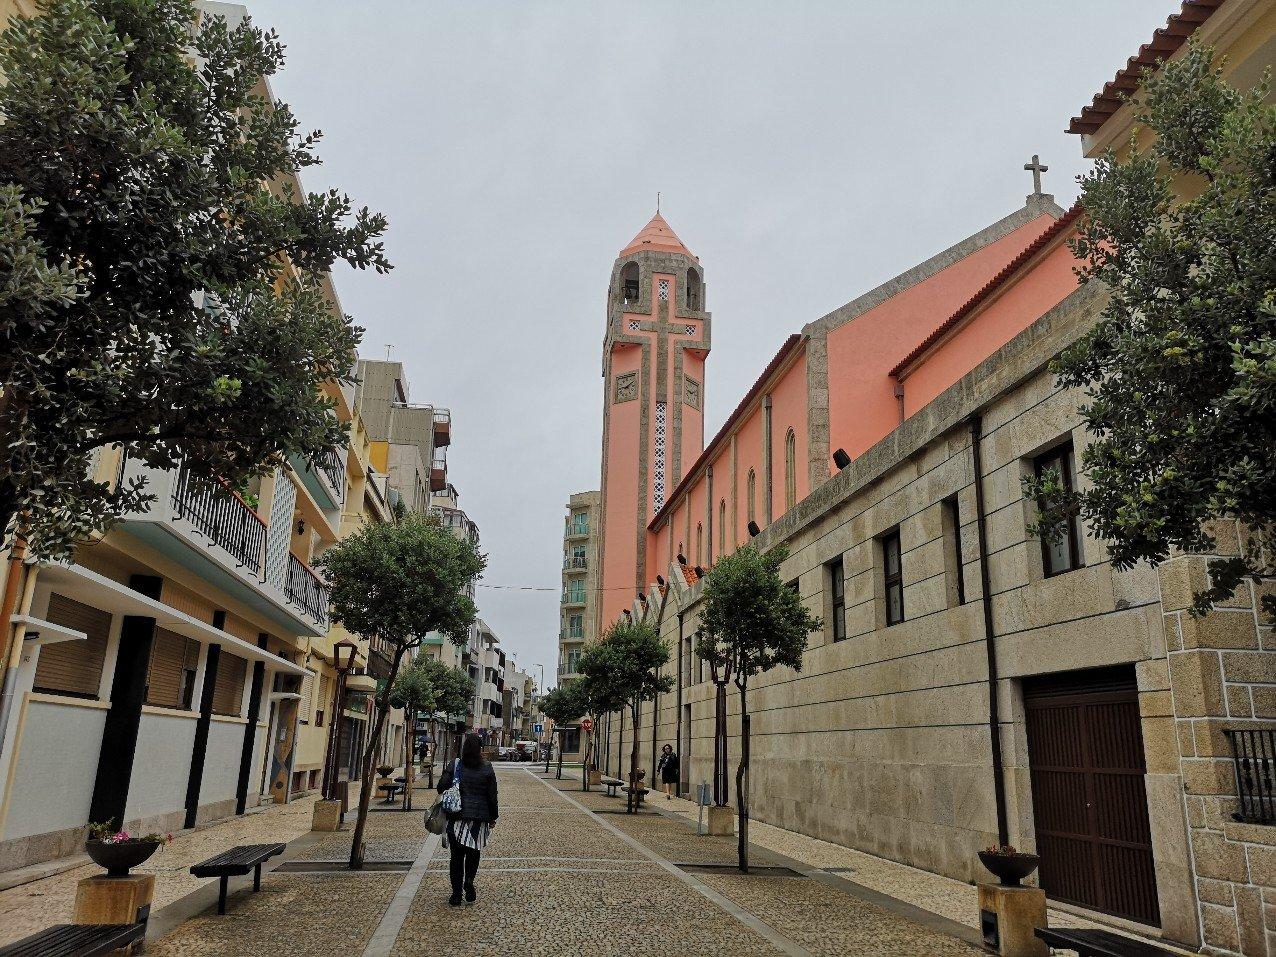 Portguese street scene